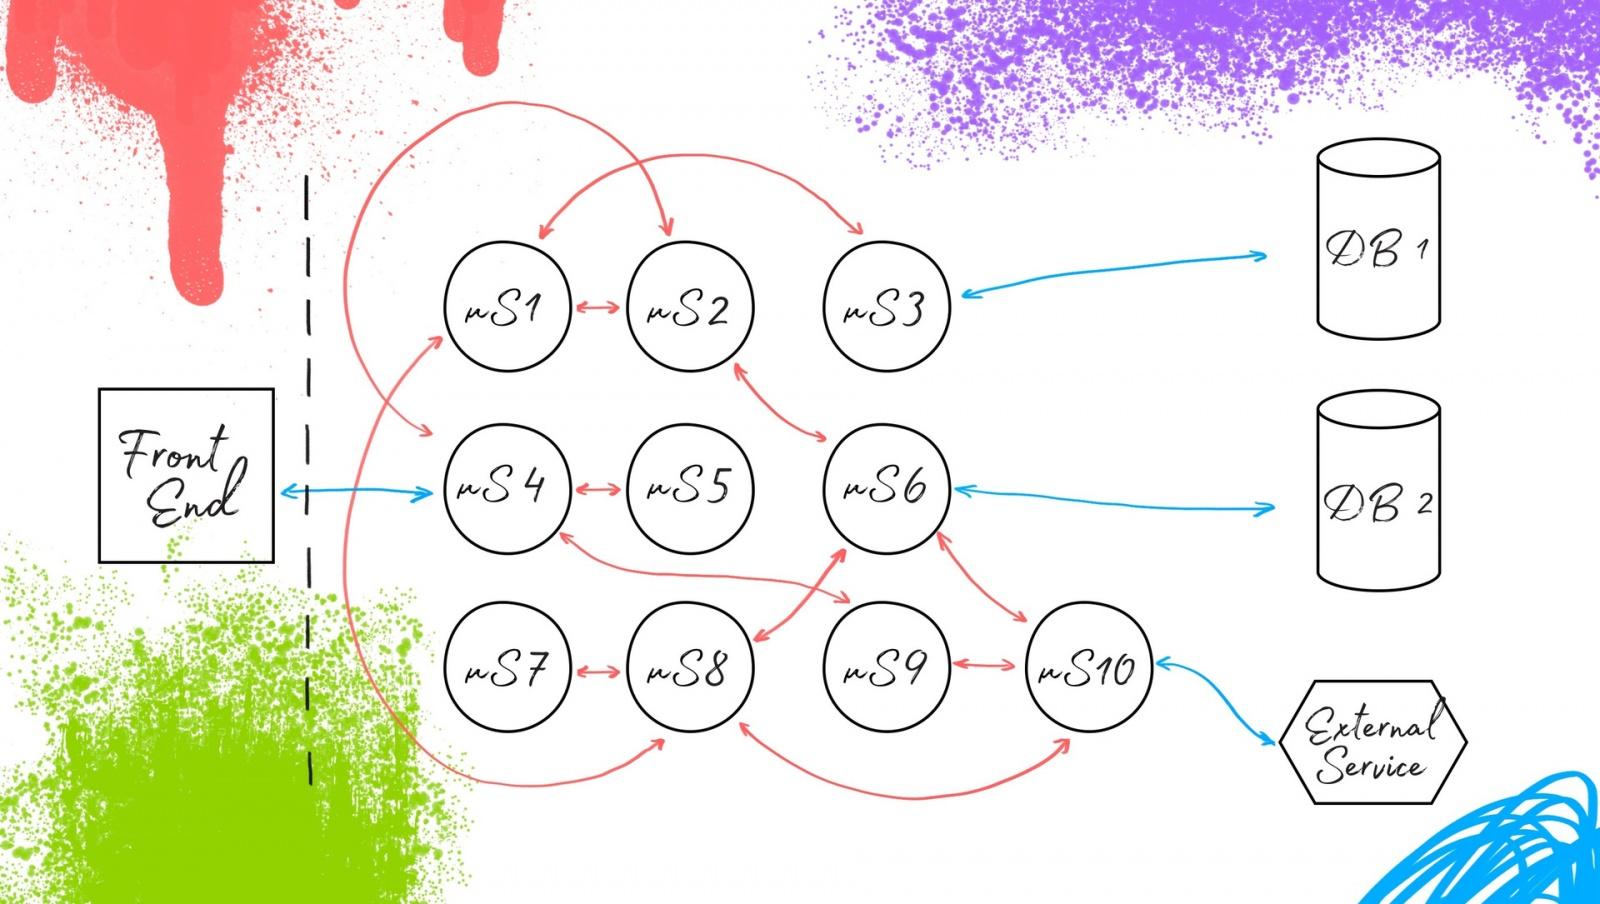 Ядро автоматизации тестирования в микросервисной архитектуре - 2